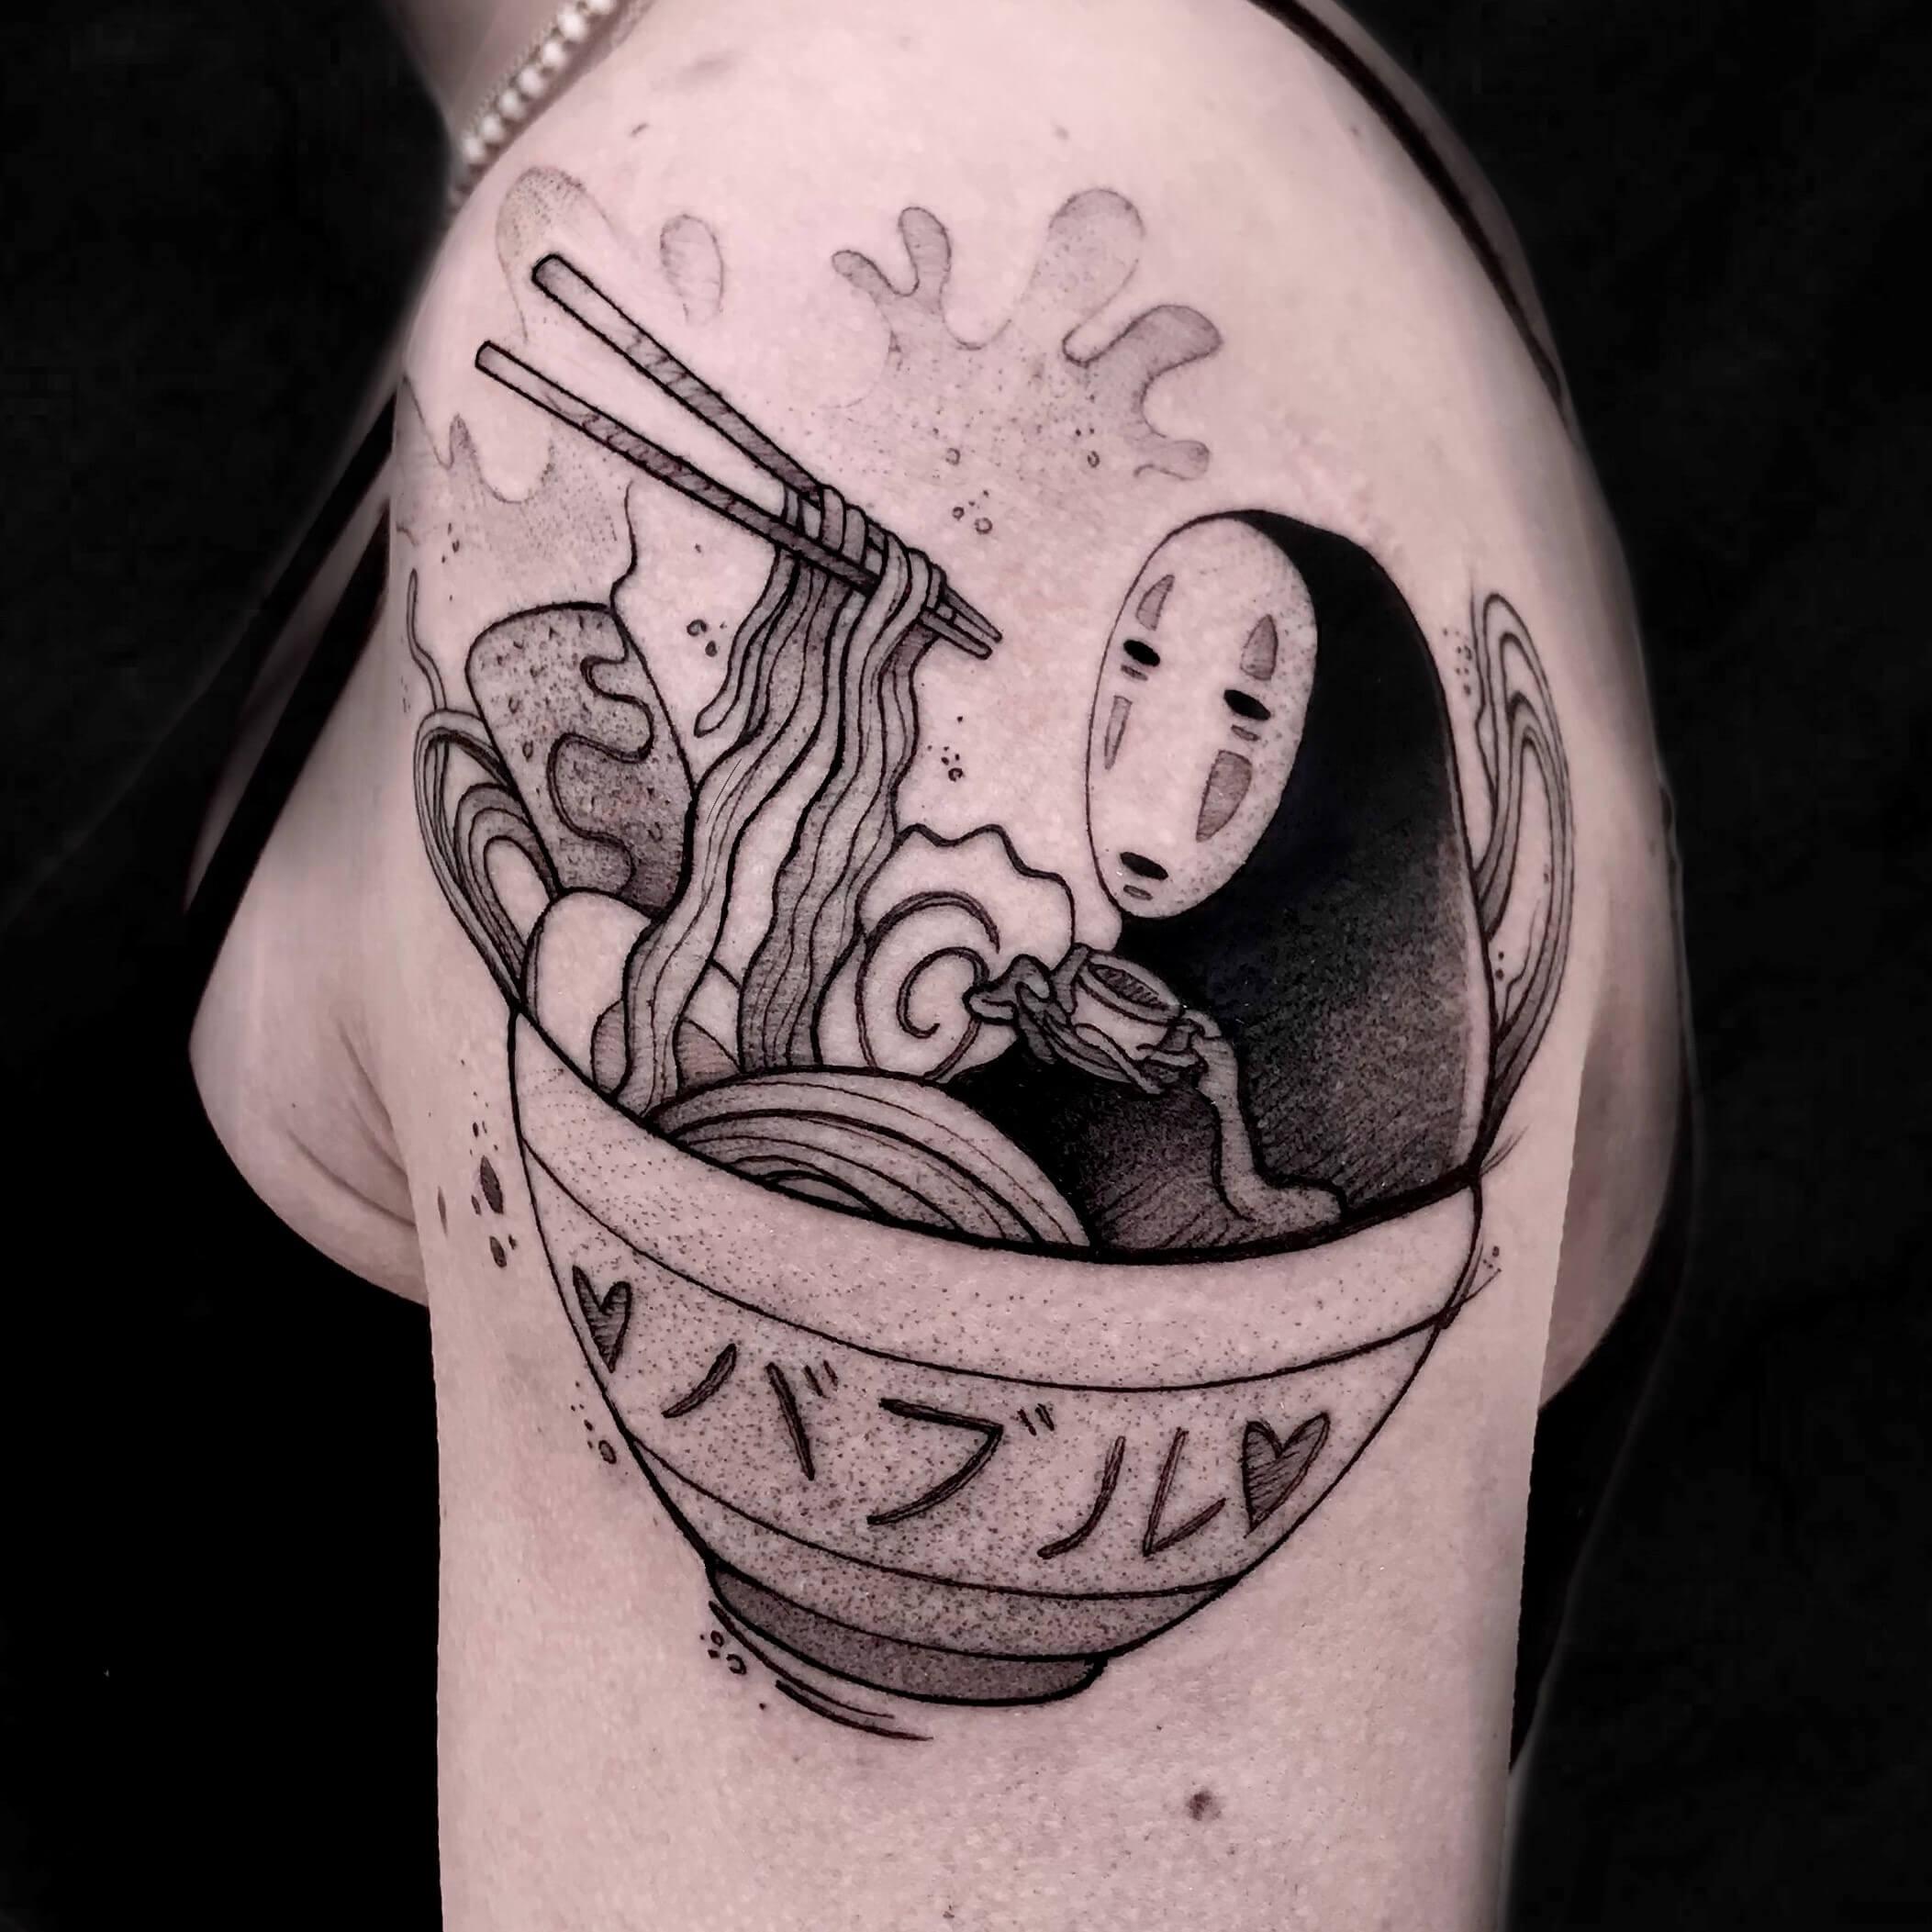 Mairy Bubble @mairy_bubble_tattoo